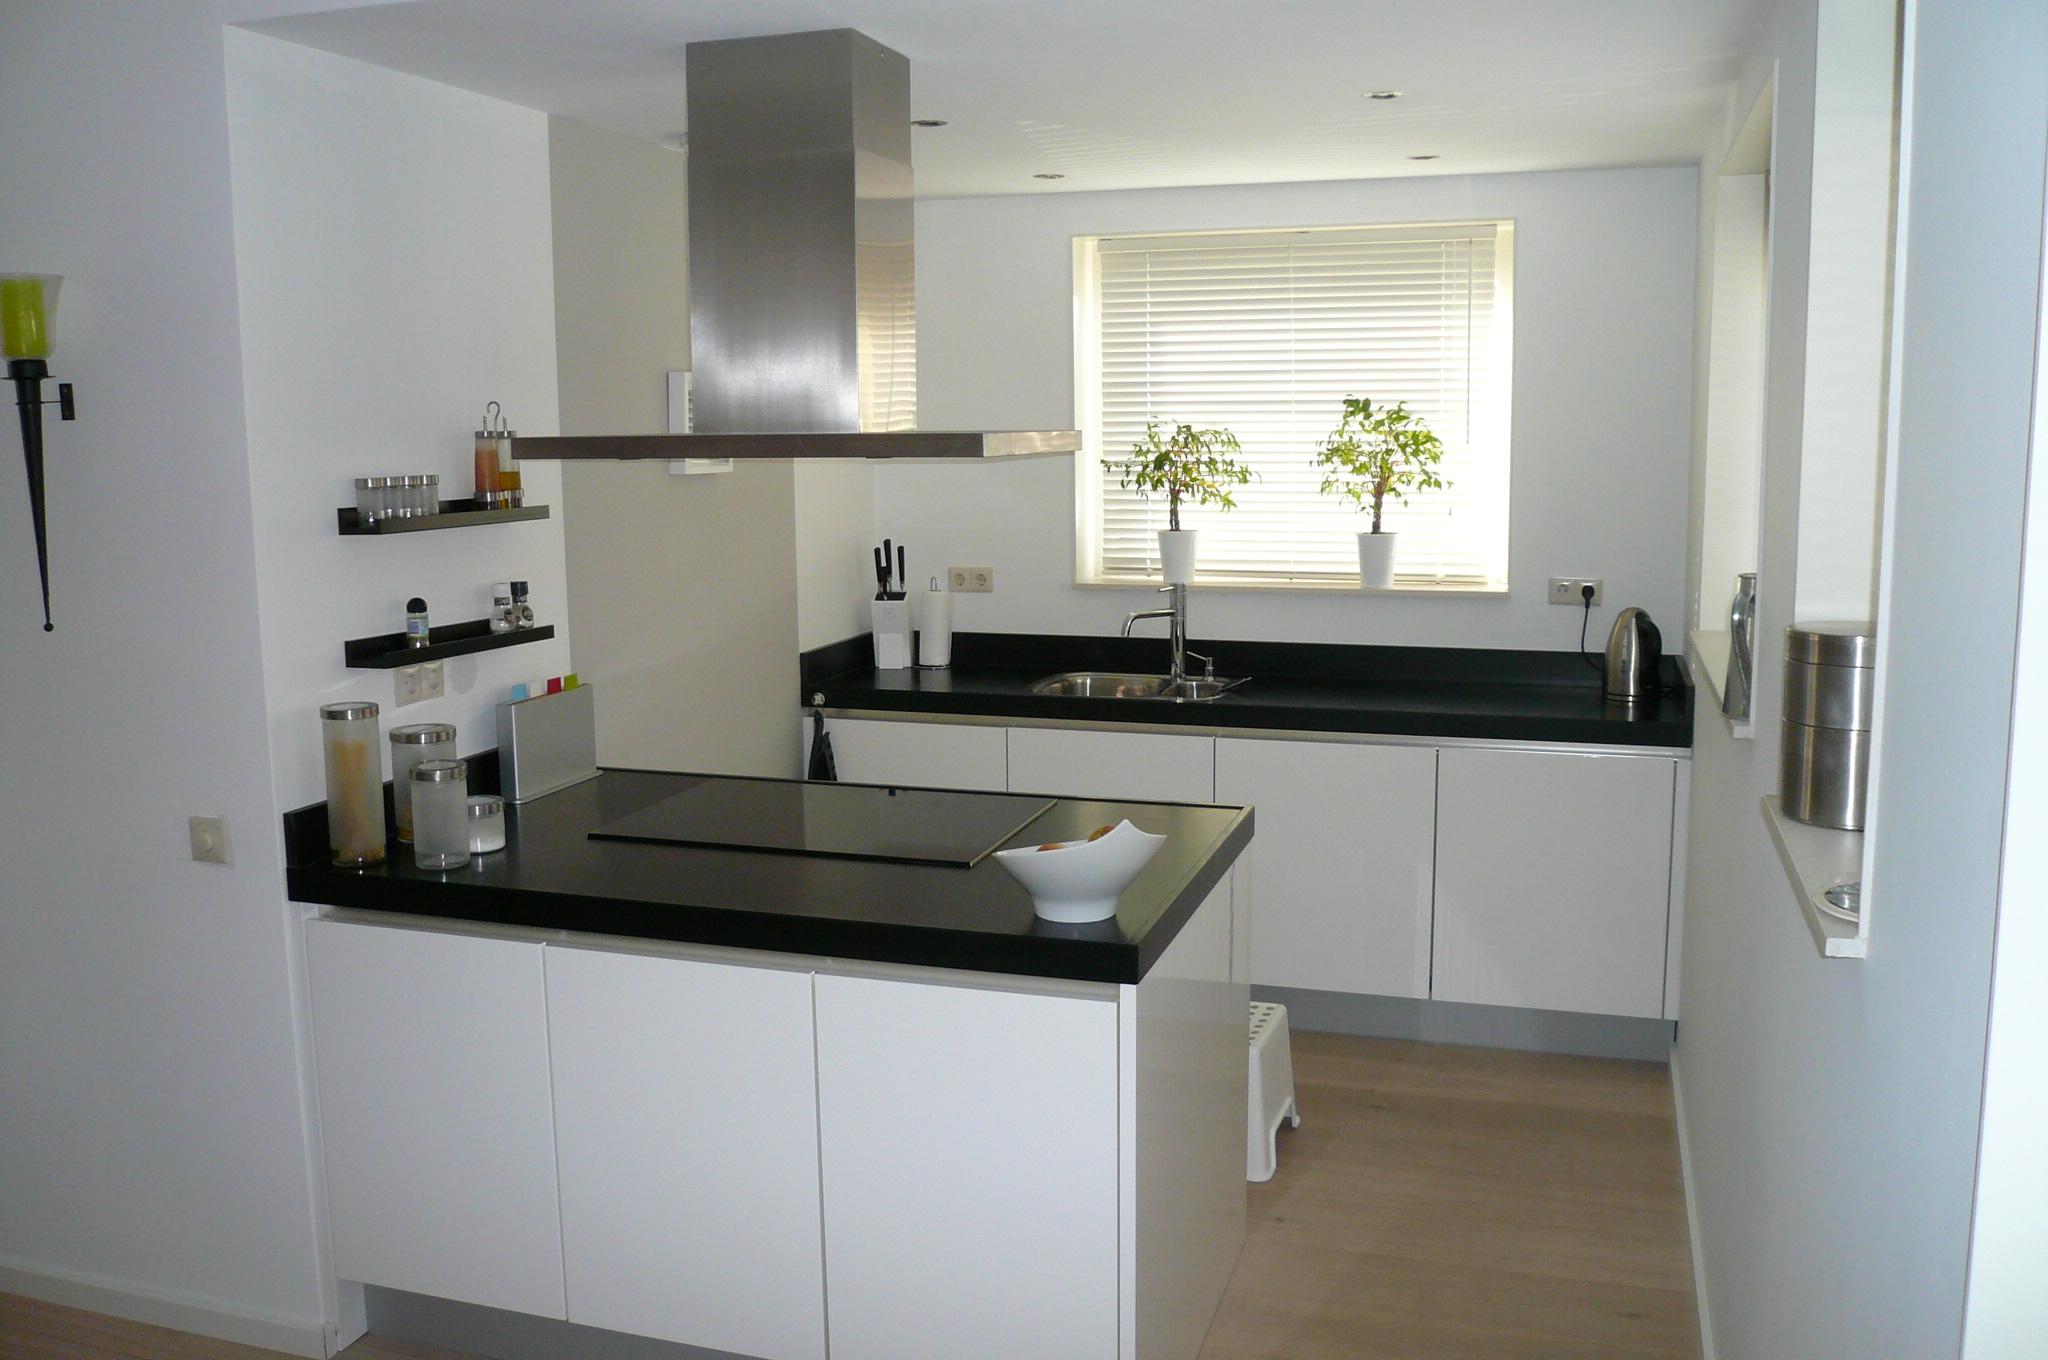 Afbeeldingen Design Keukens : Moderne keukens